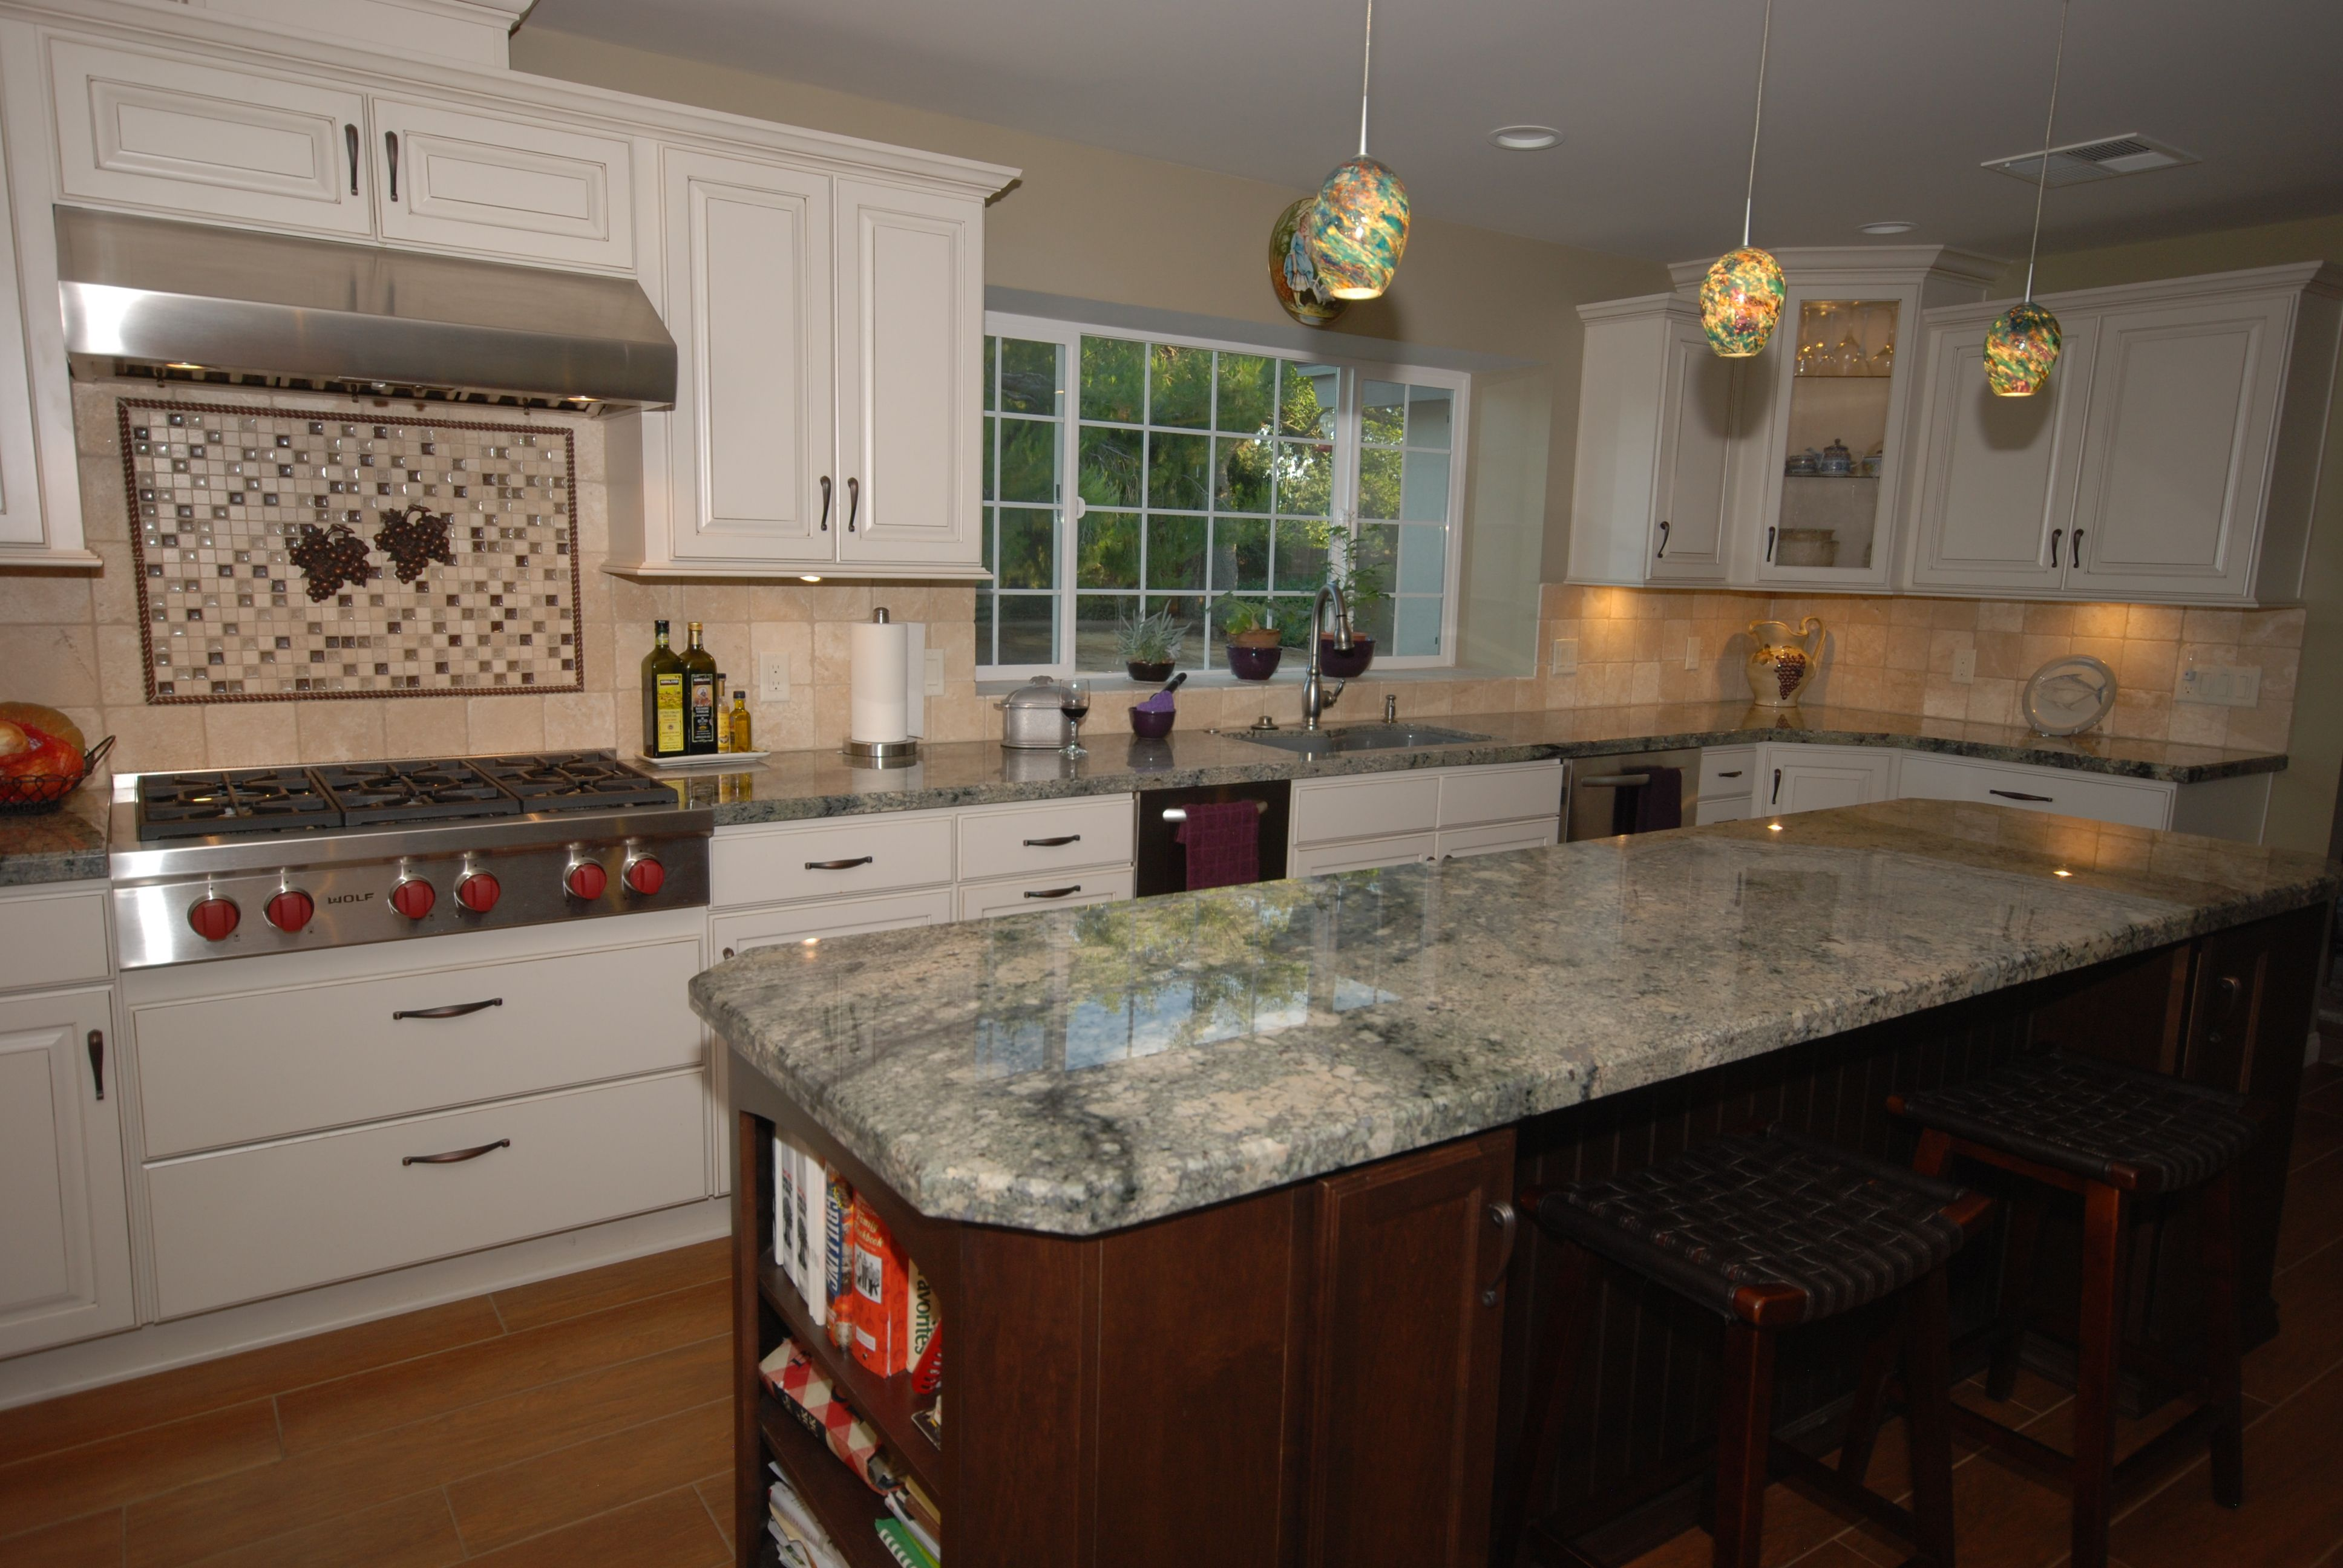 Starmark Maple Macadamia With Chocolate Glaze And Mocha Island Delirium Granite Wolf Cooktop And Vent Kitchen Cabinets In Bathroom Off White Kitchens Kitchen